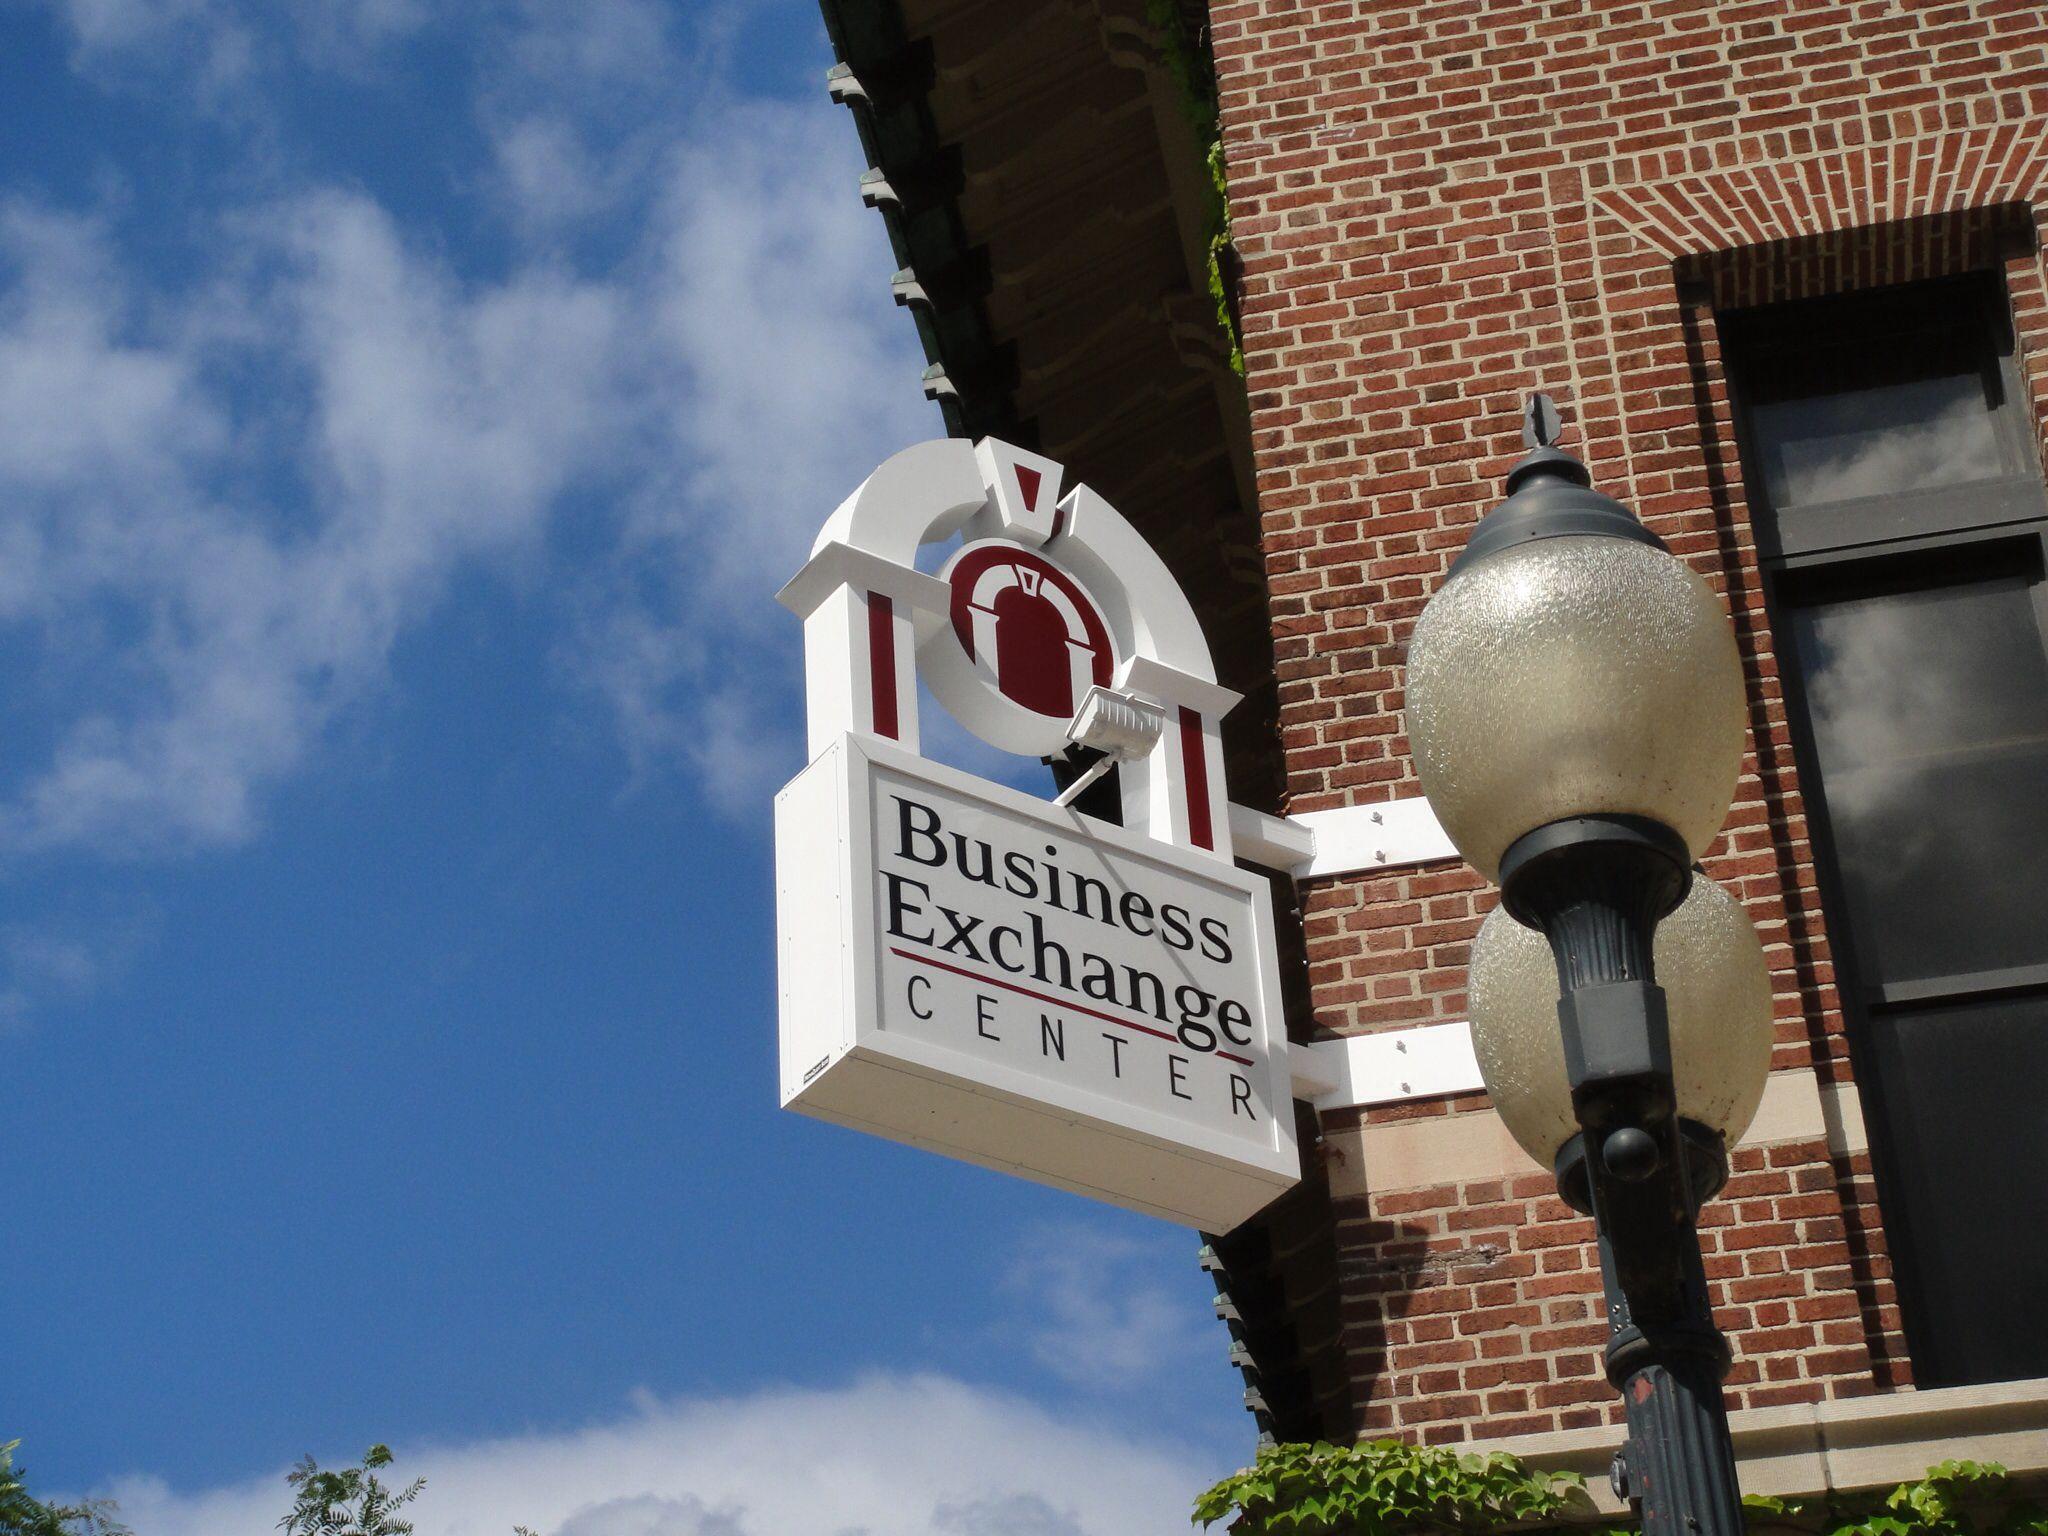 Business Exchange Center Cedar Rapids Iowa (With images